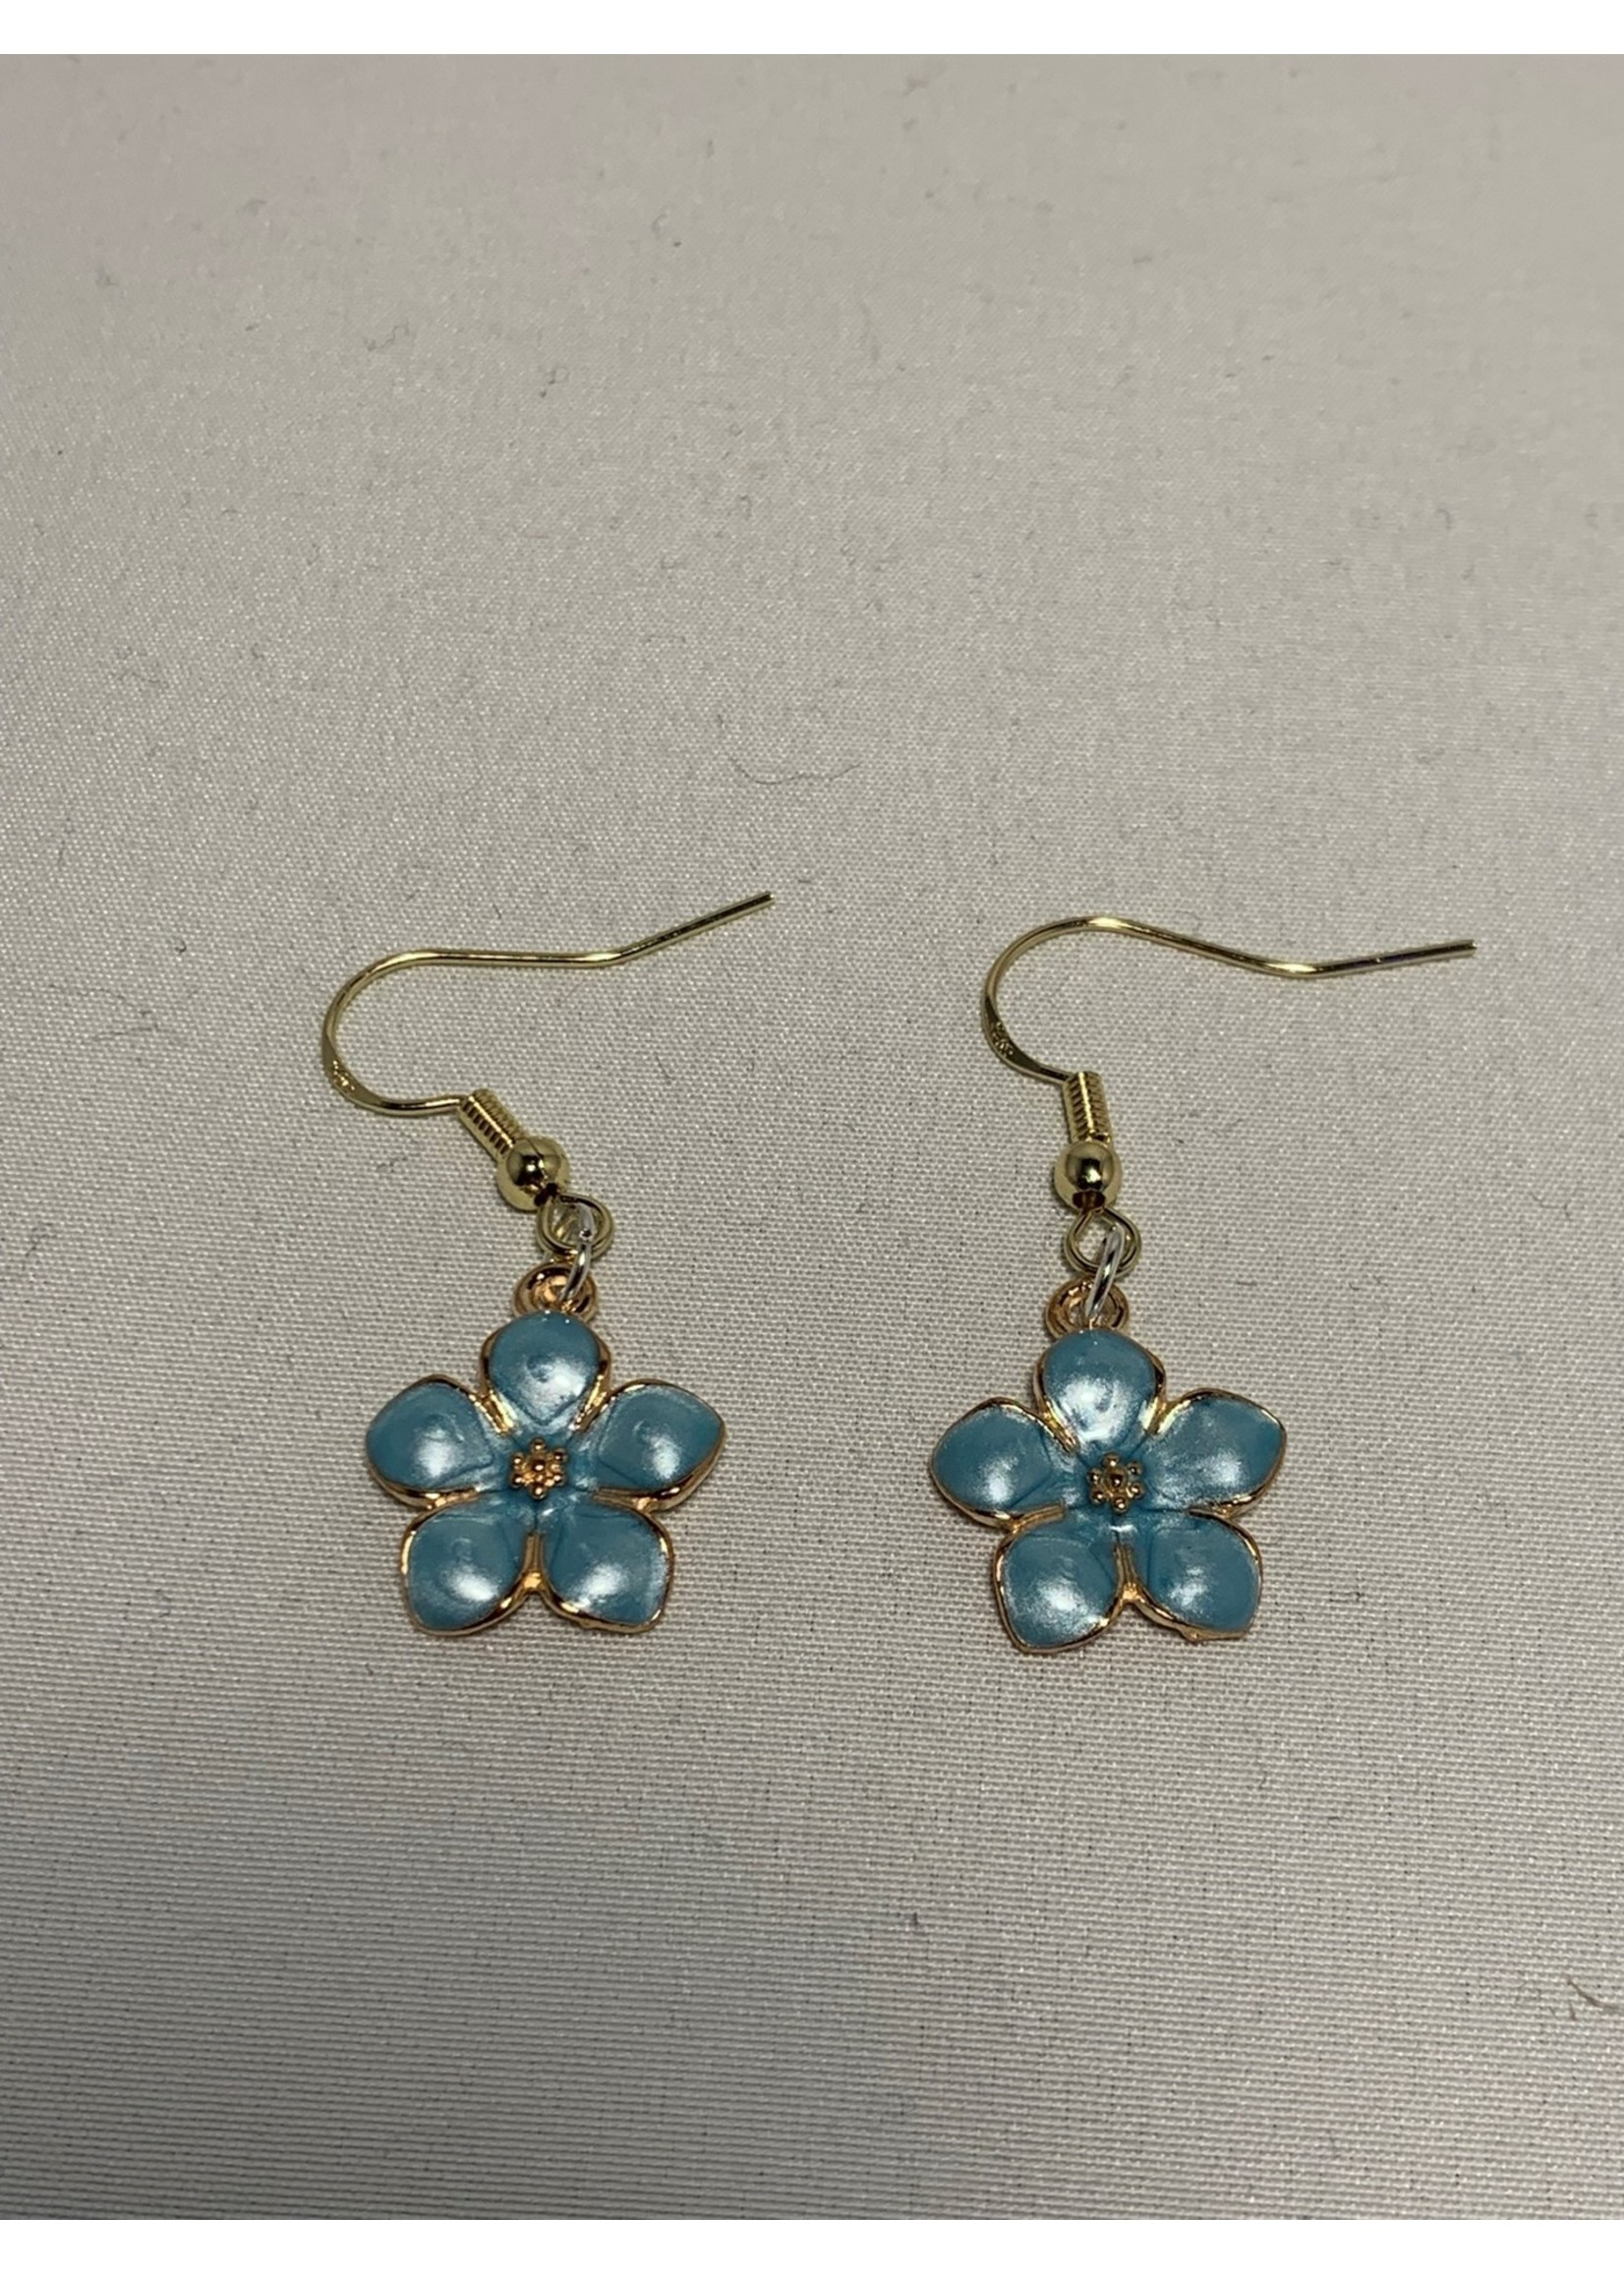 Earrings Pearl Blue Flowers